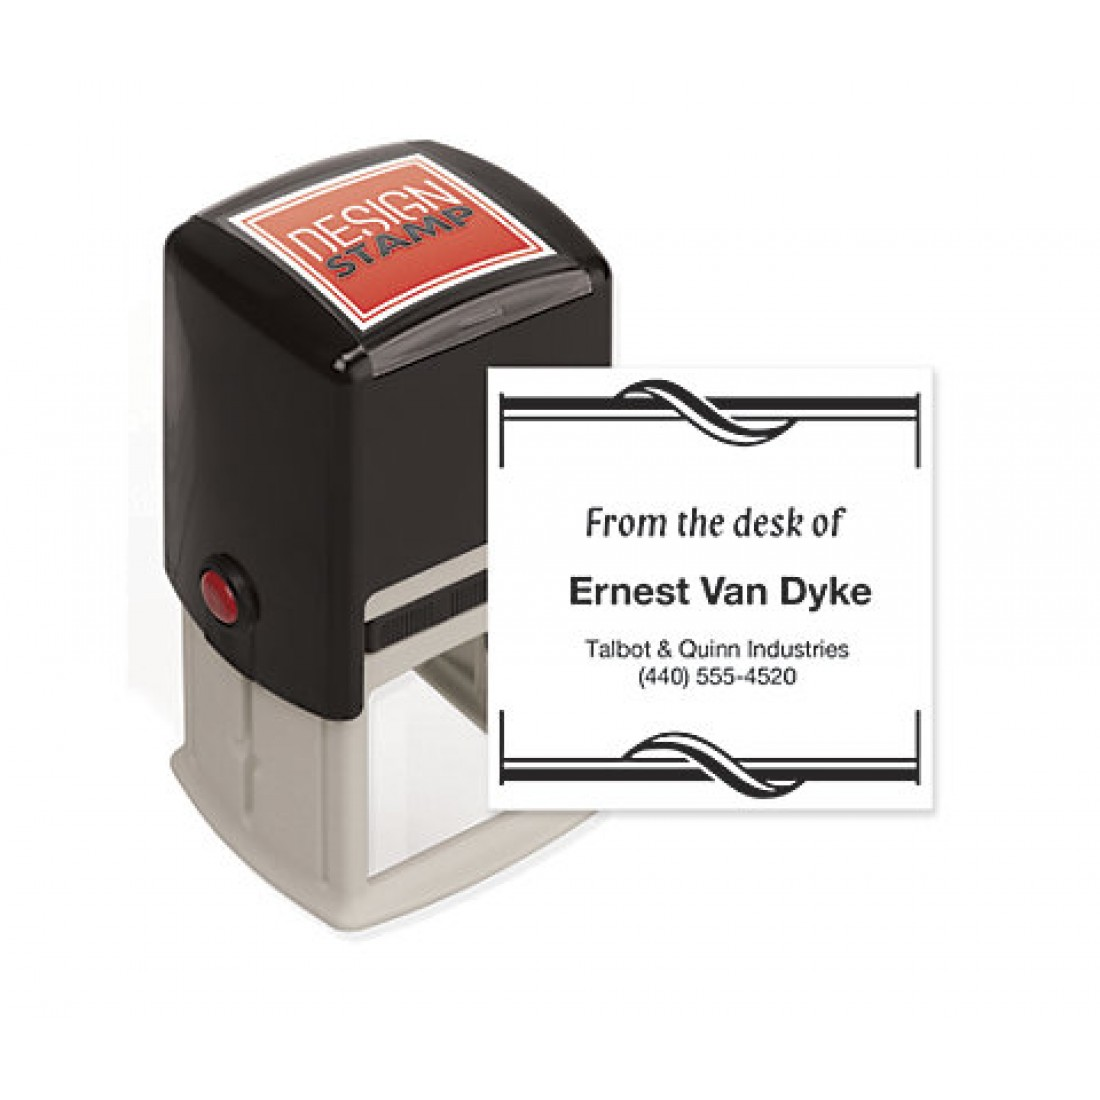 Speedball SpeedyCarve Rubber Stamp Making Kit  Great